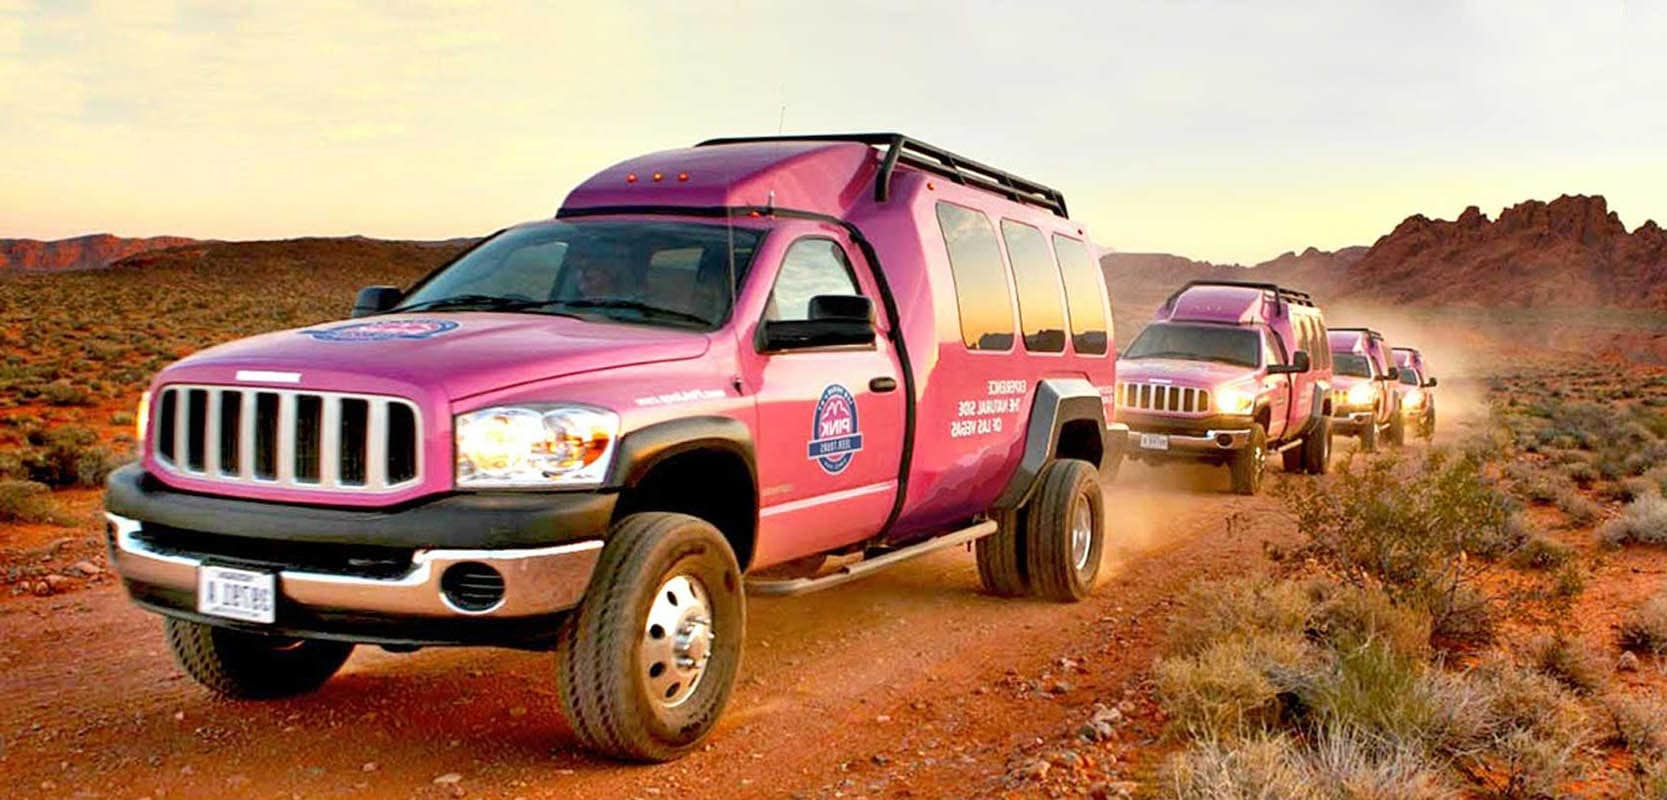 Pink Jeep Adventure Tours   Las Vegas Gallery Image 1